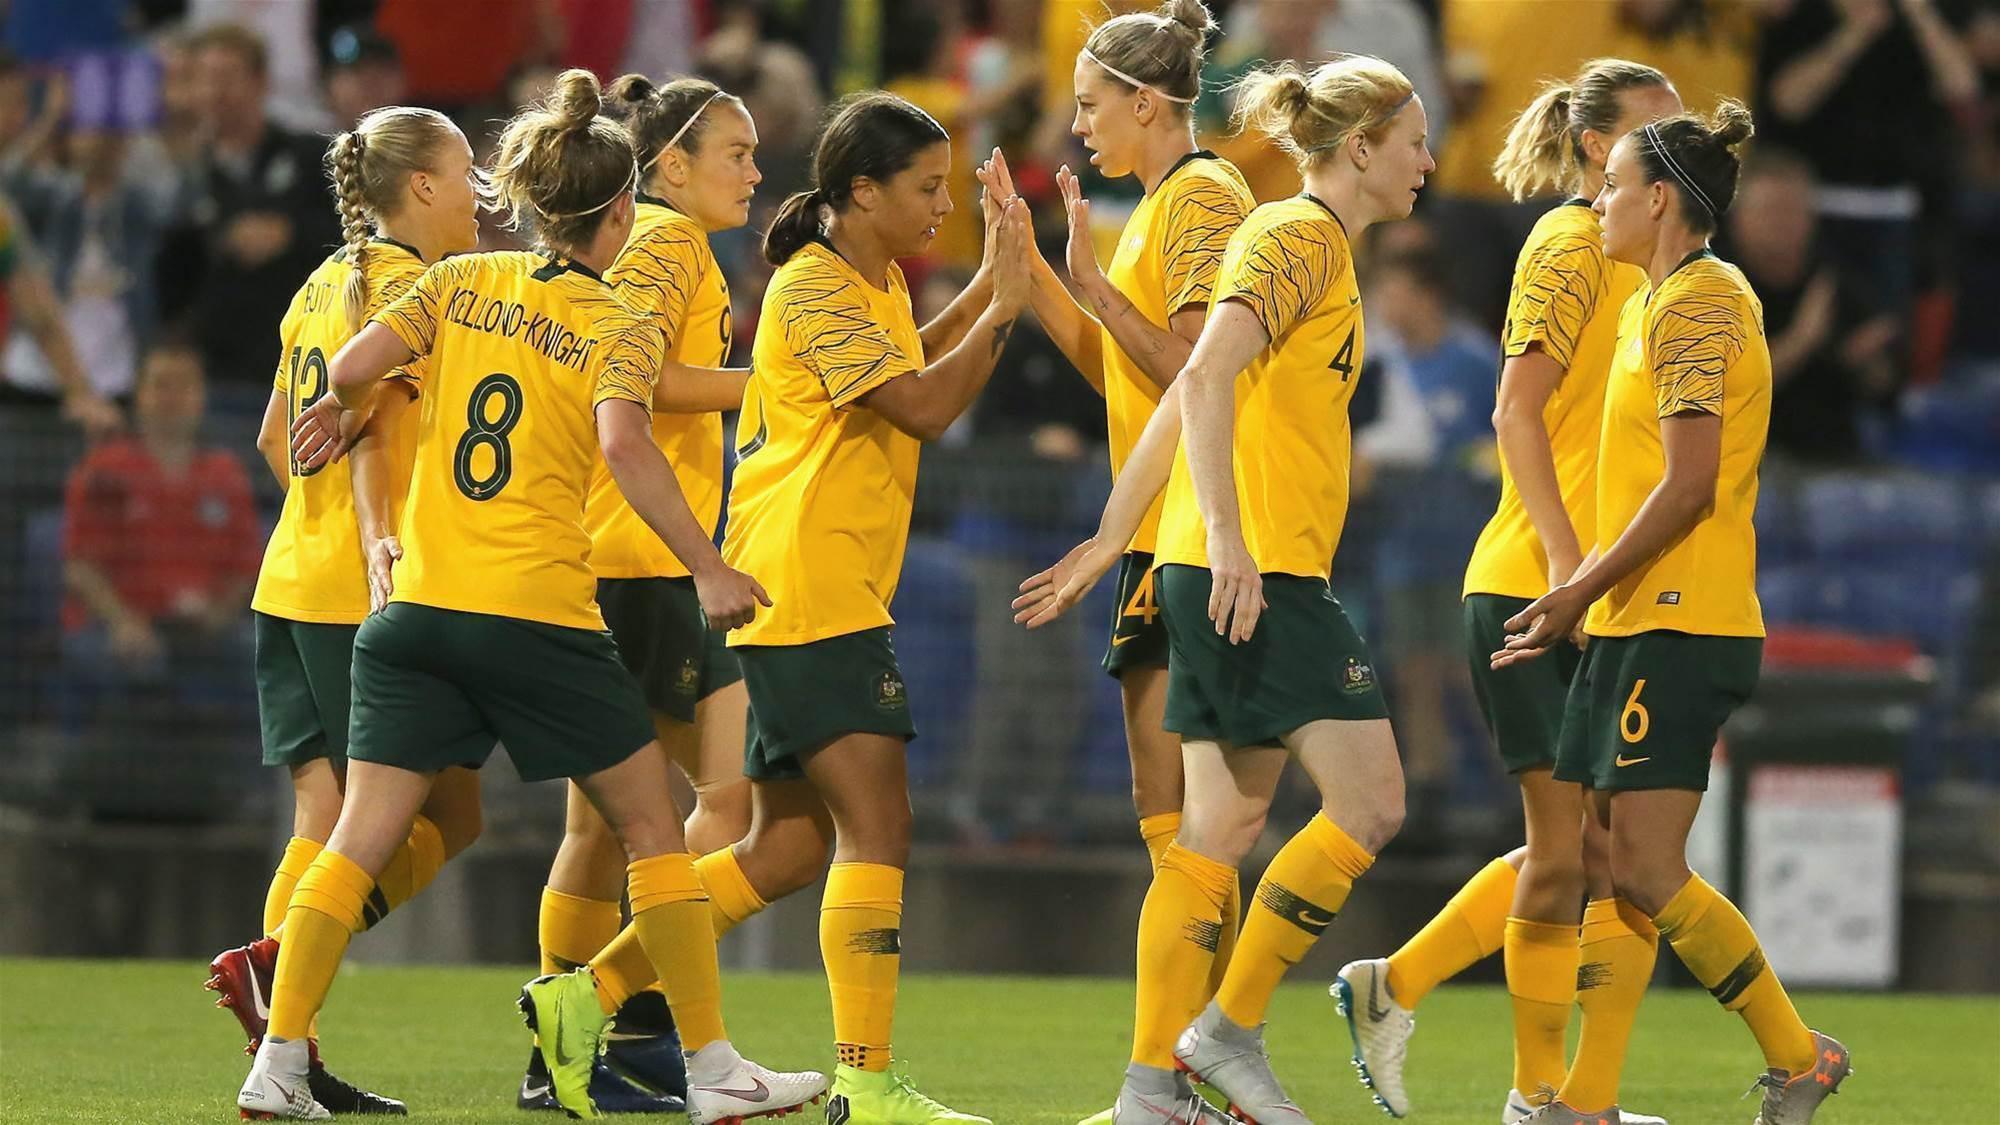 Matildas' 5-star second half